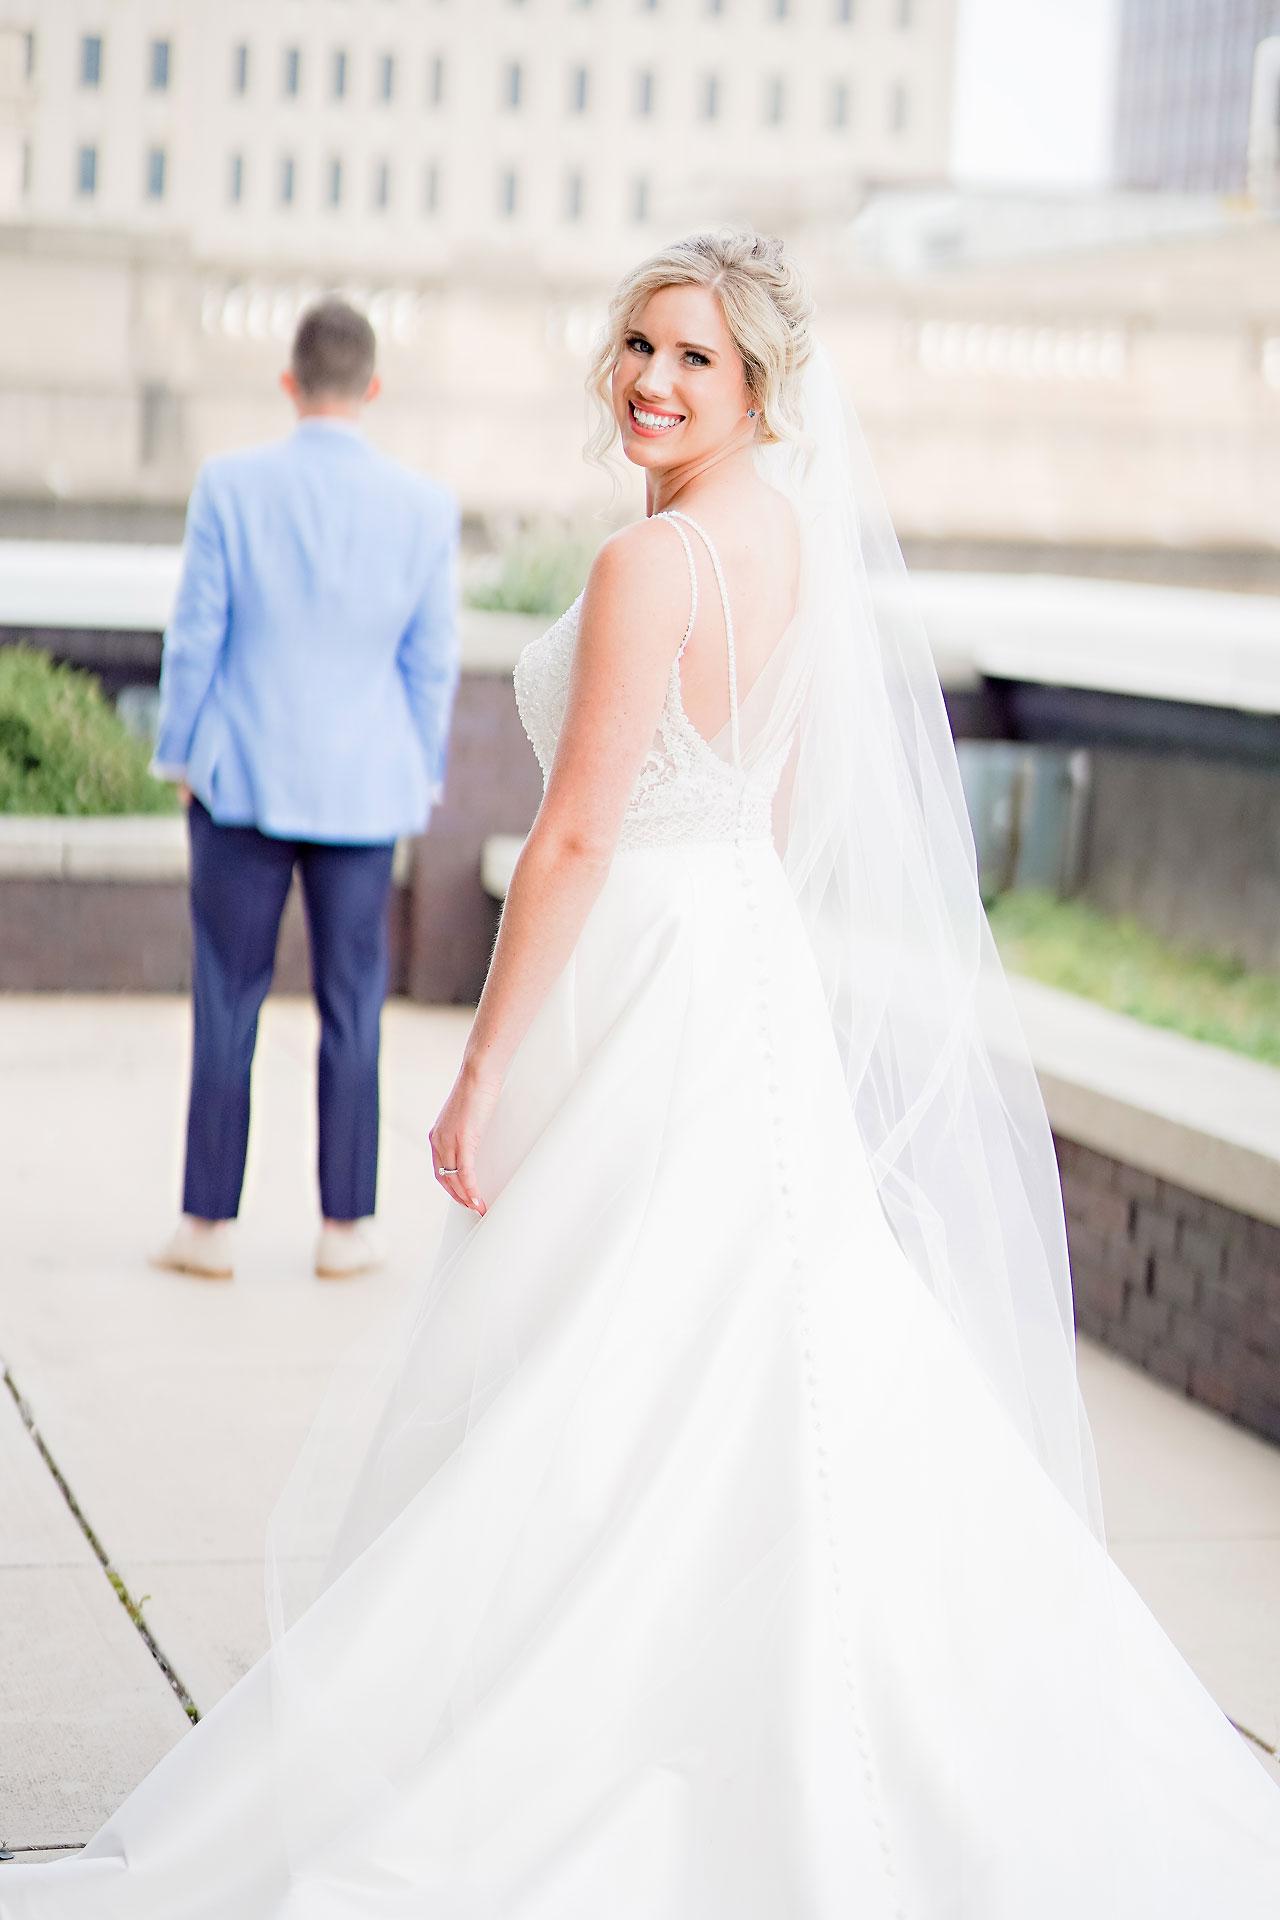 Sammi Jack Regions Tower JPS Events Indianapolis Wedding 050